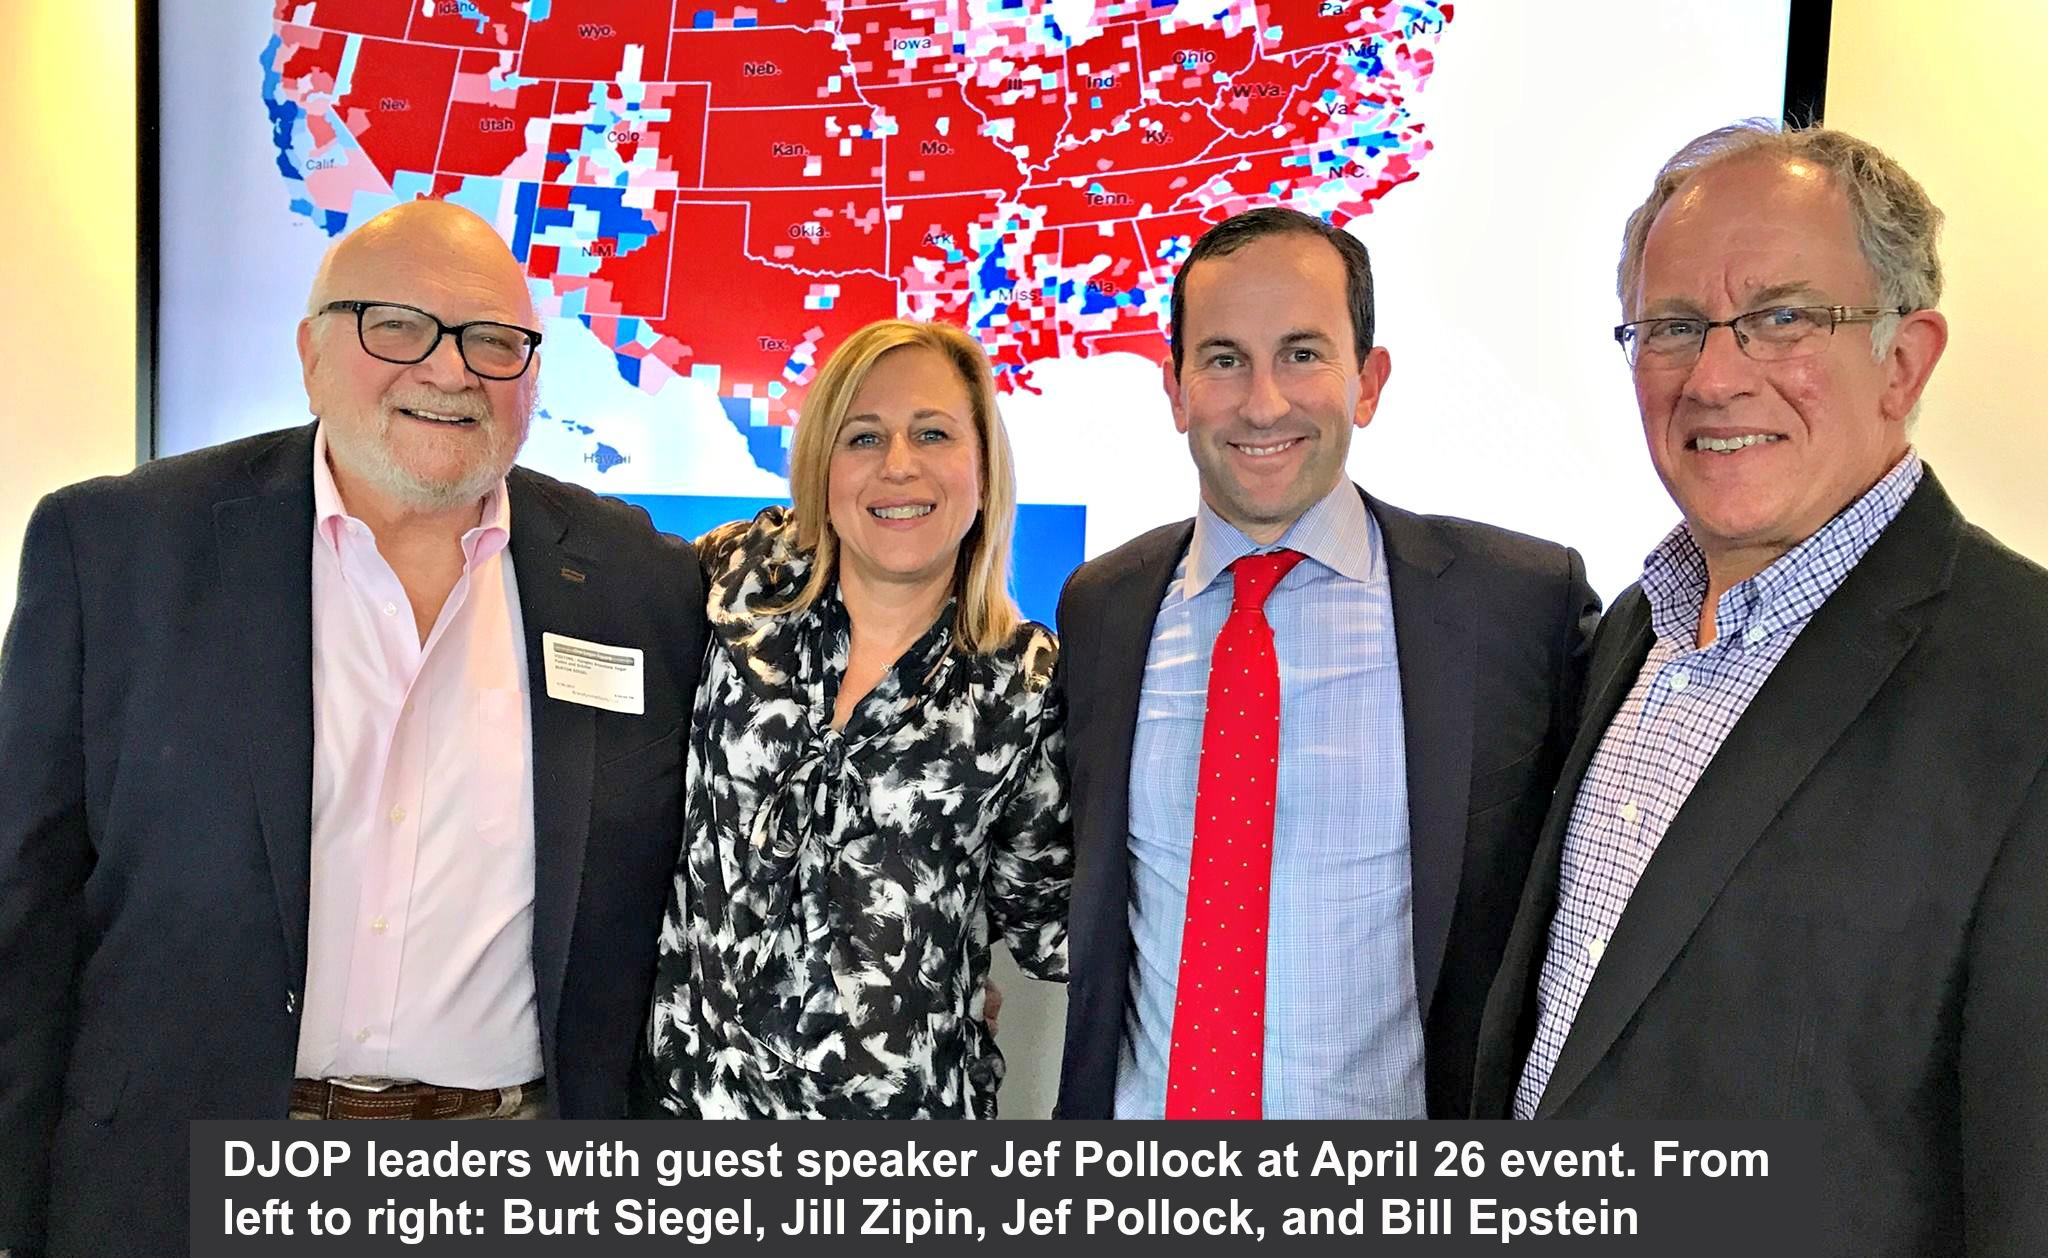 Burt Jill Jef and Bill E at 4.26.17 DJOP Event_With Caption